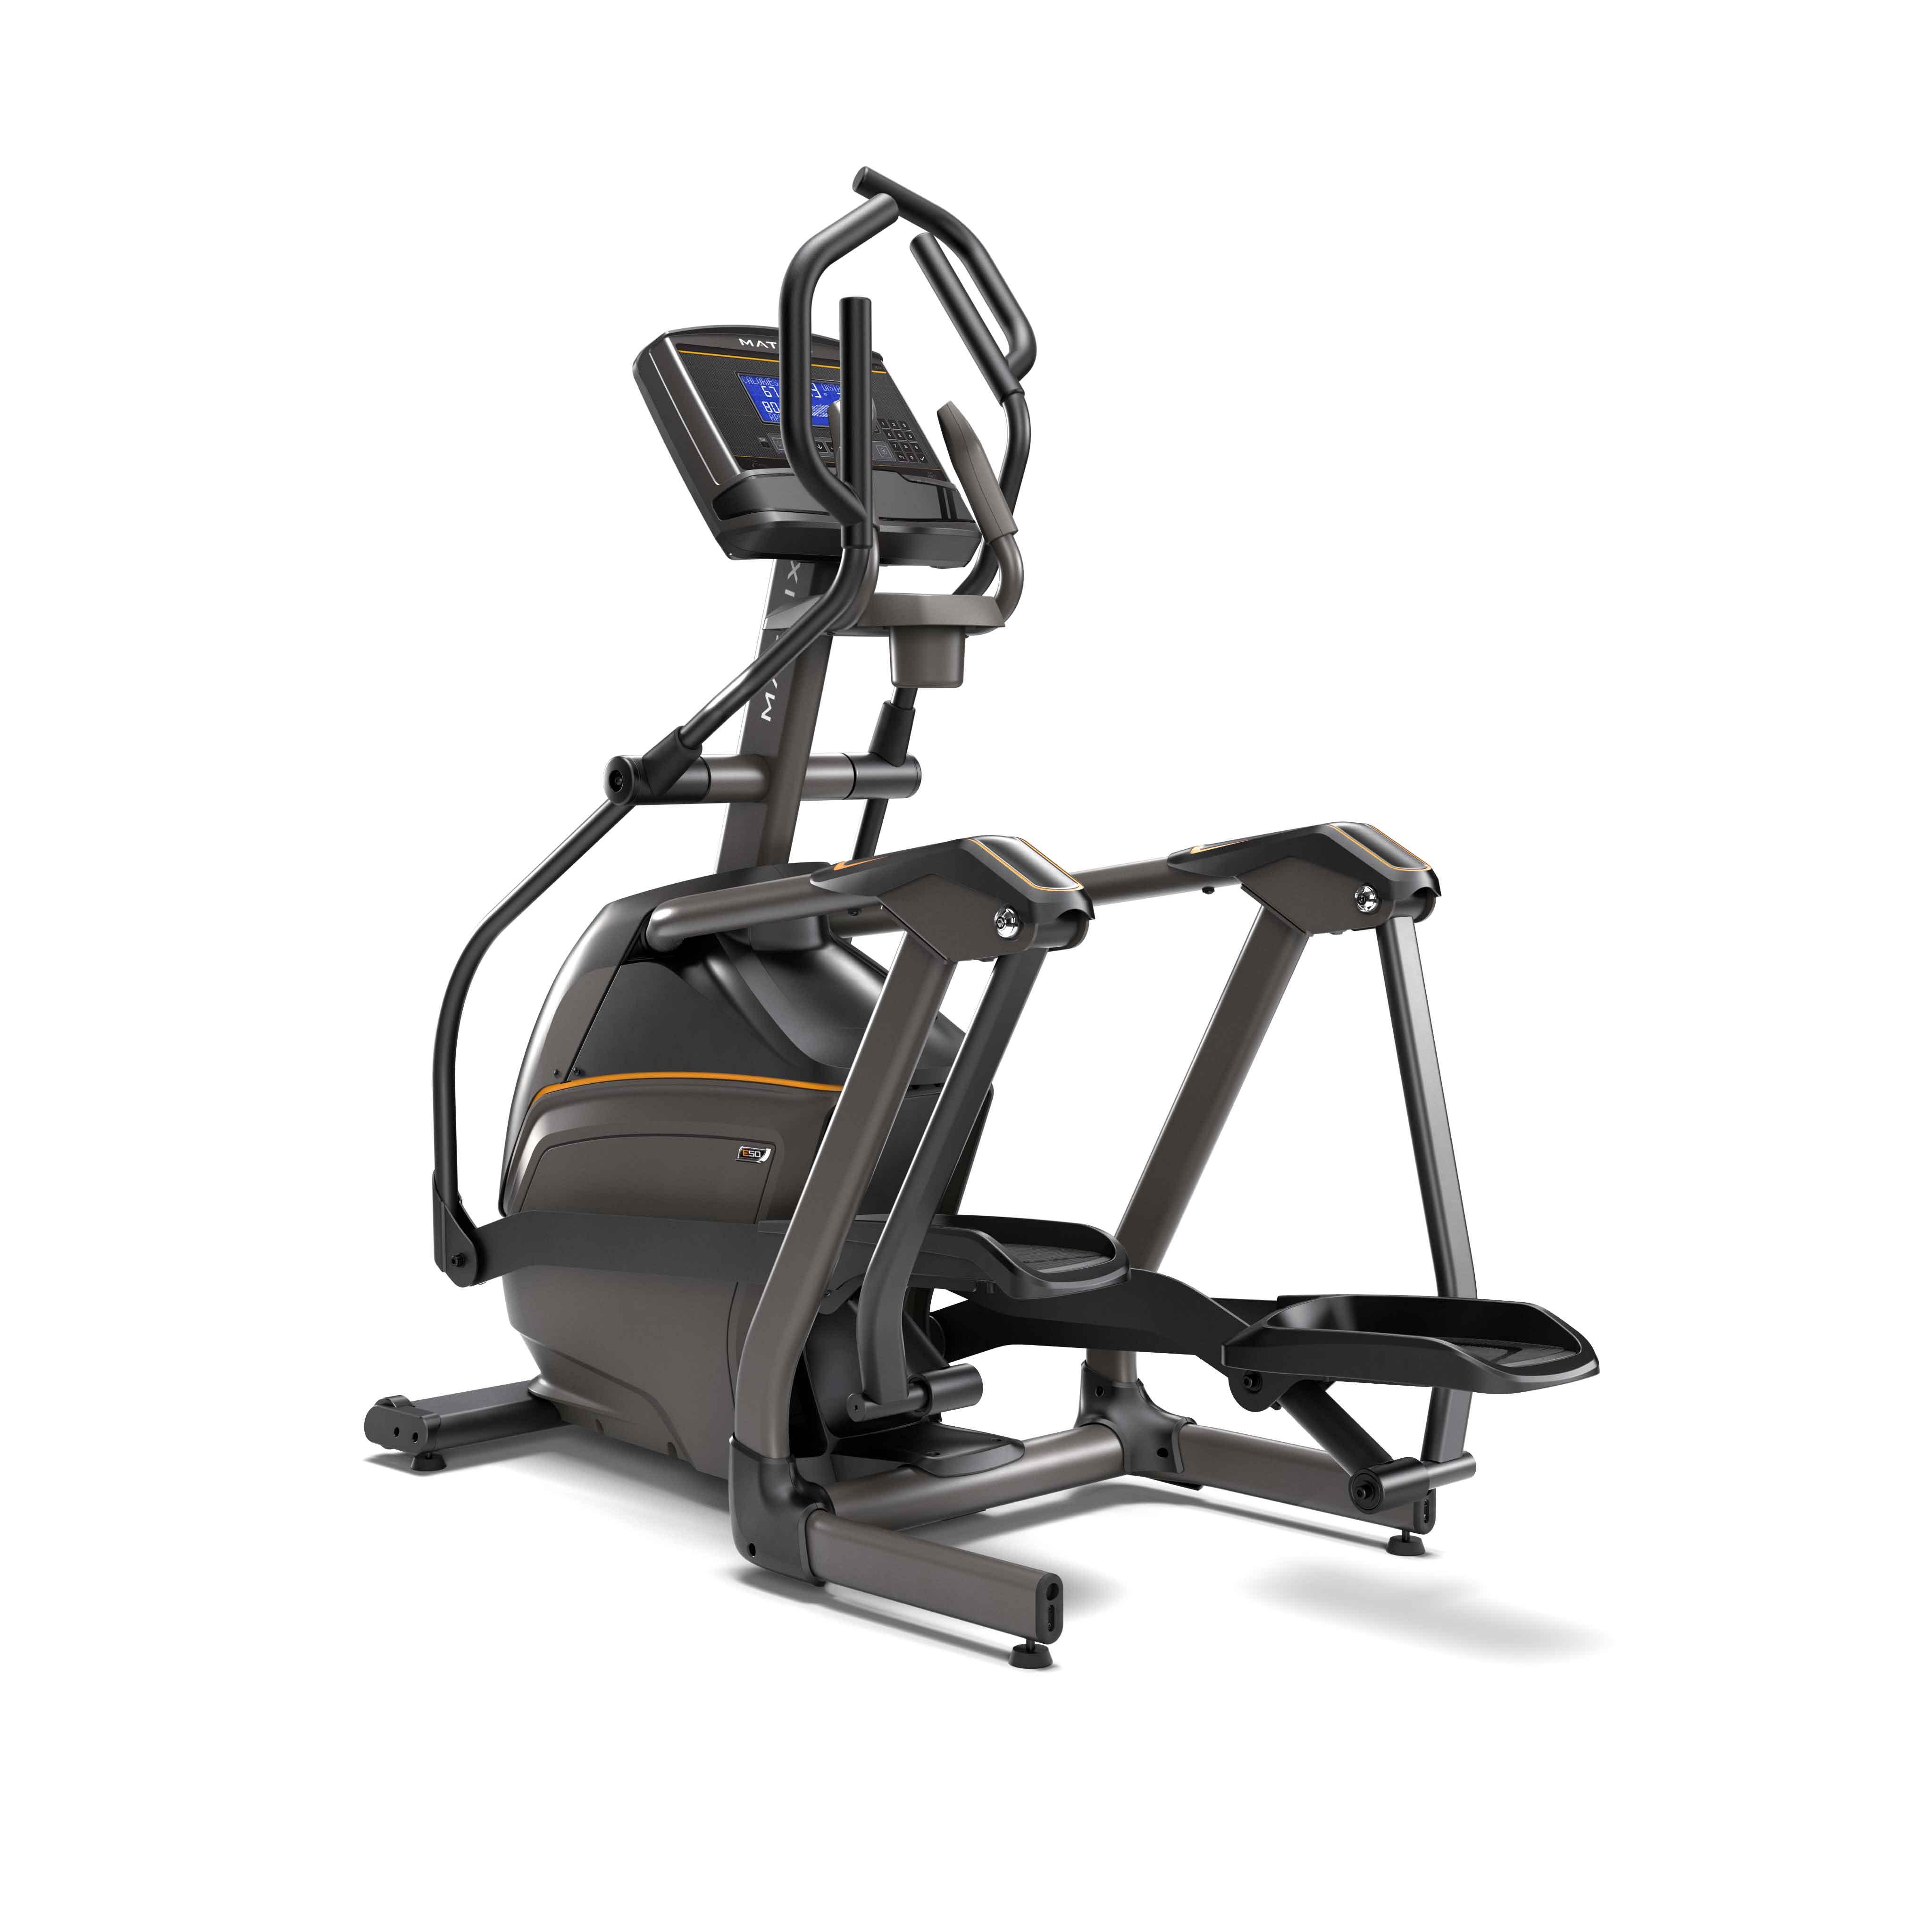 Bicicleta fitness eliptica Matrix E50 XR [0]